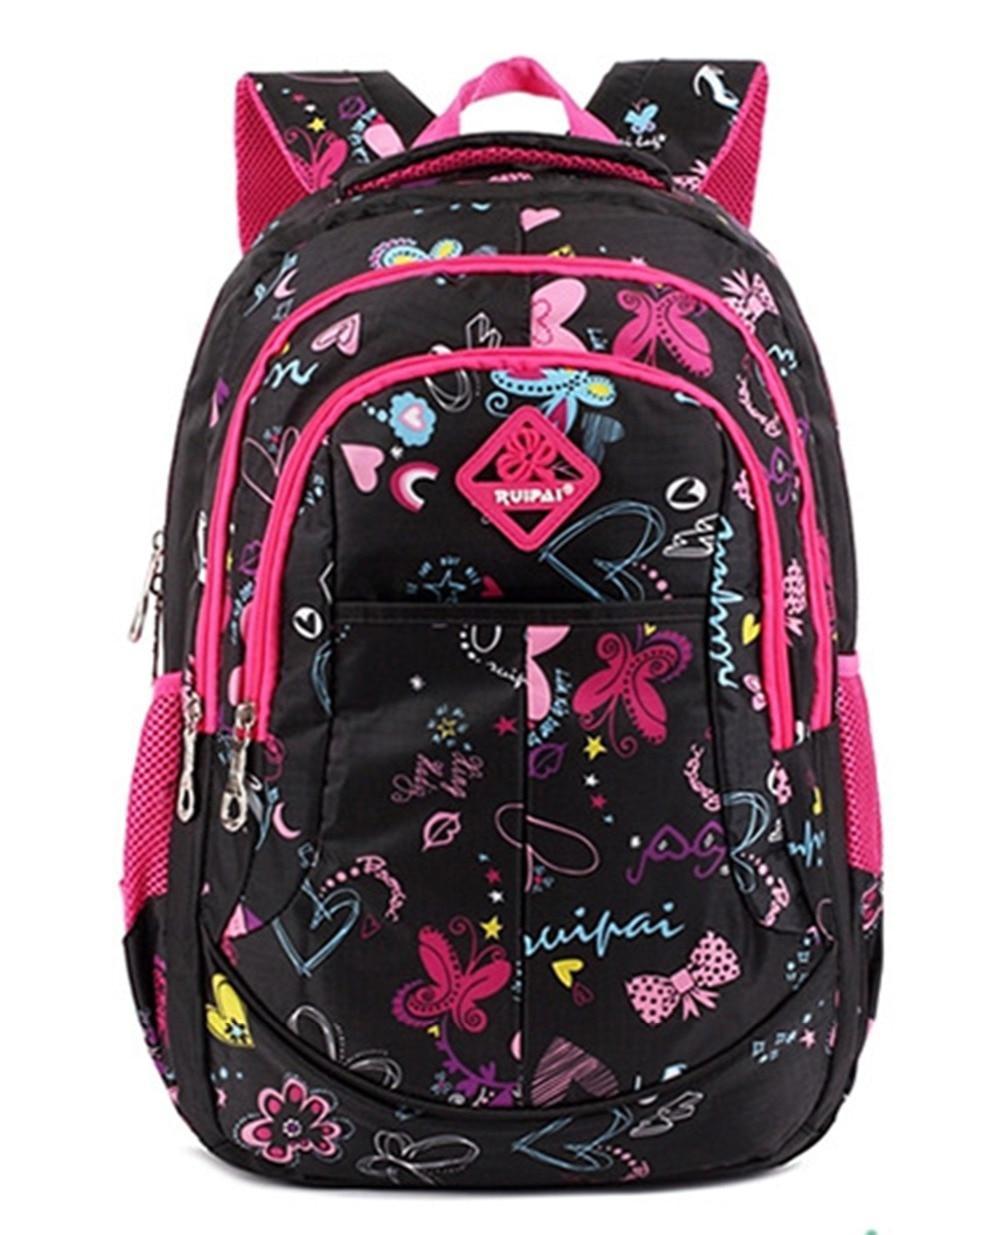 school bag child backpack backpack bags school backpacks schoolbag leather bags lovely children backpacks kids mochila